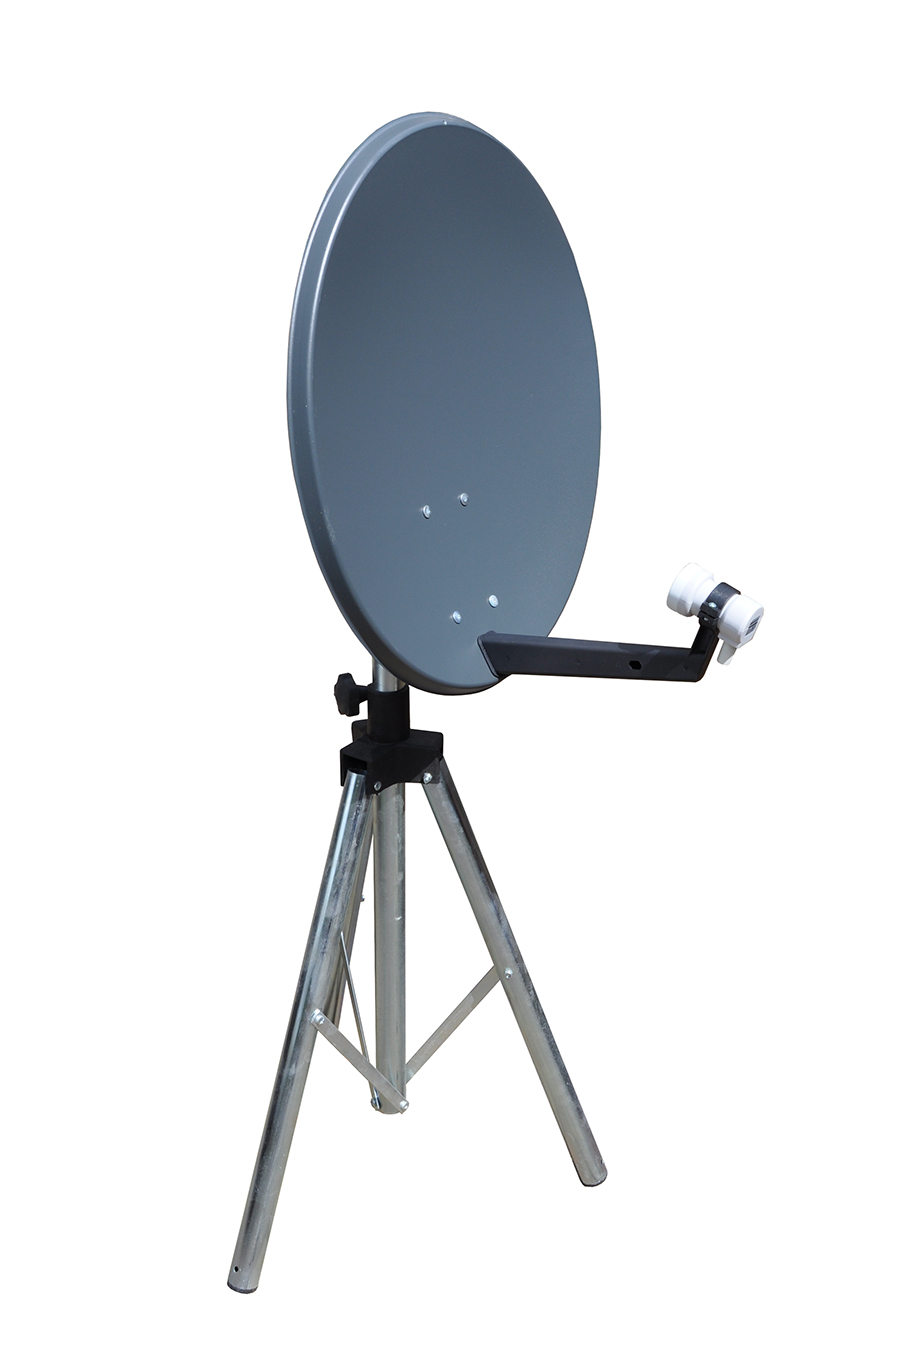 Antena sat kempingowa 60 cm ze statywem